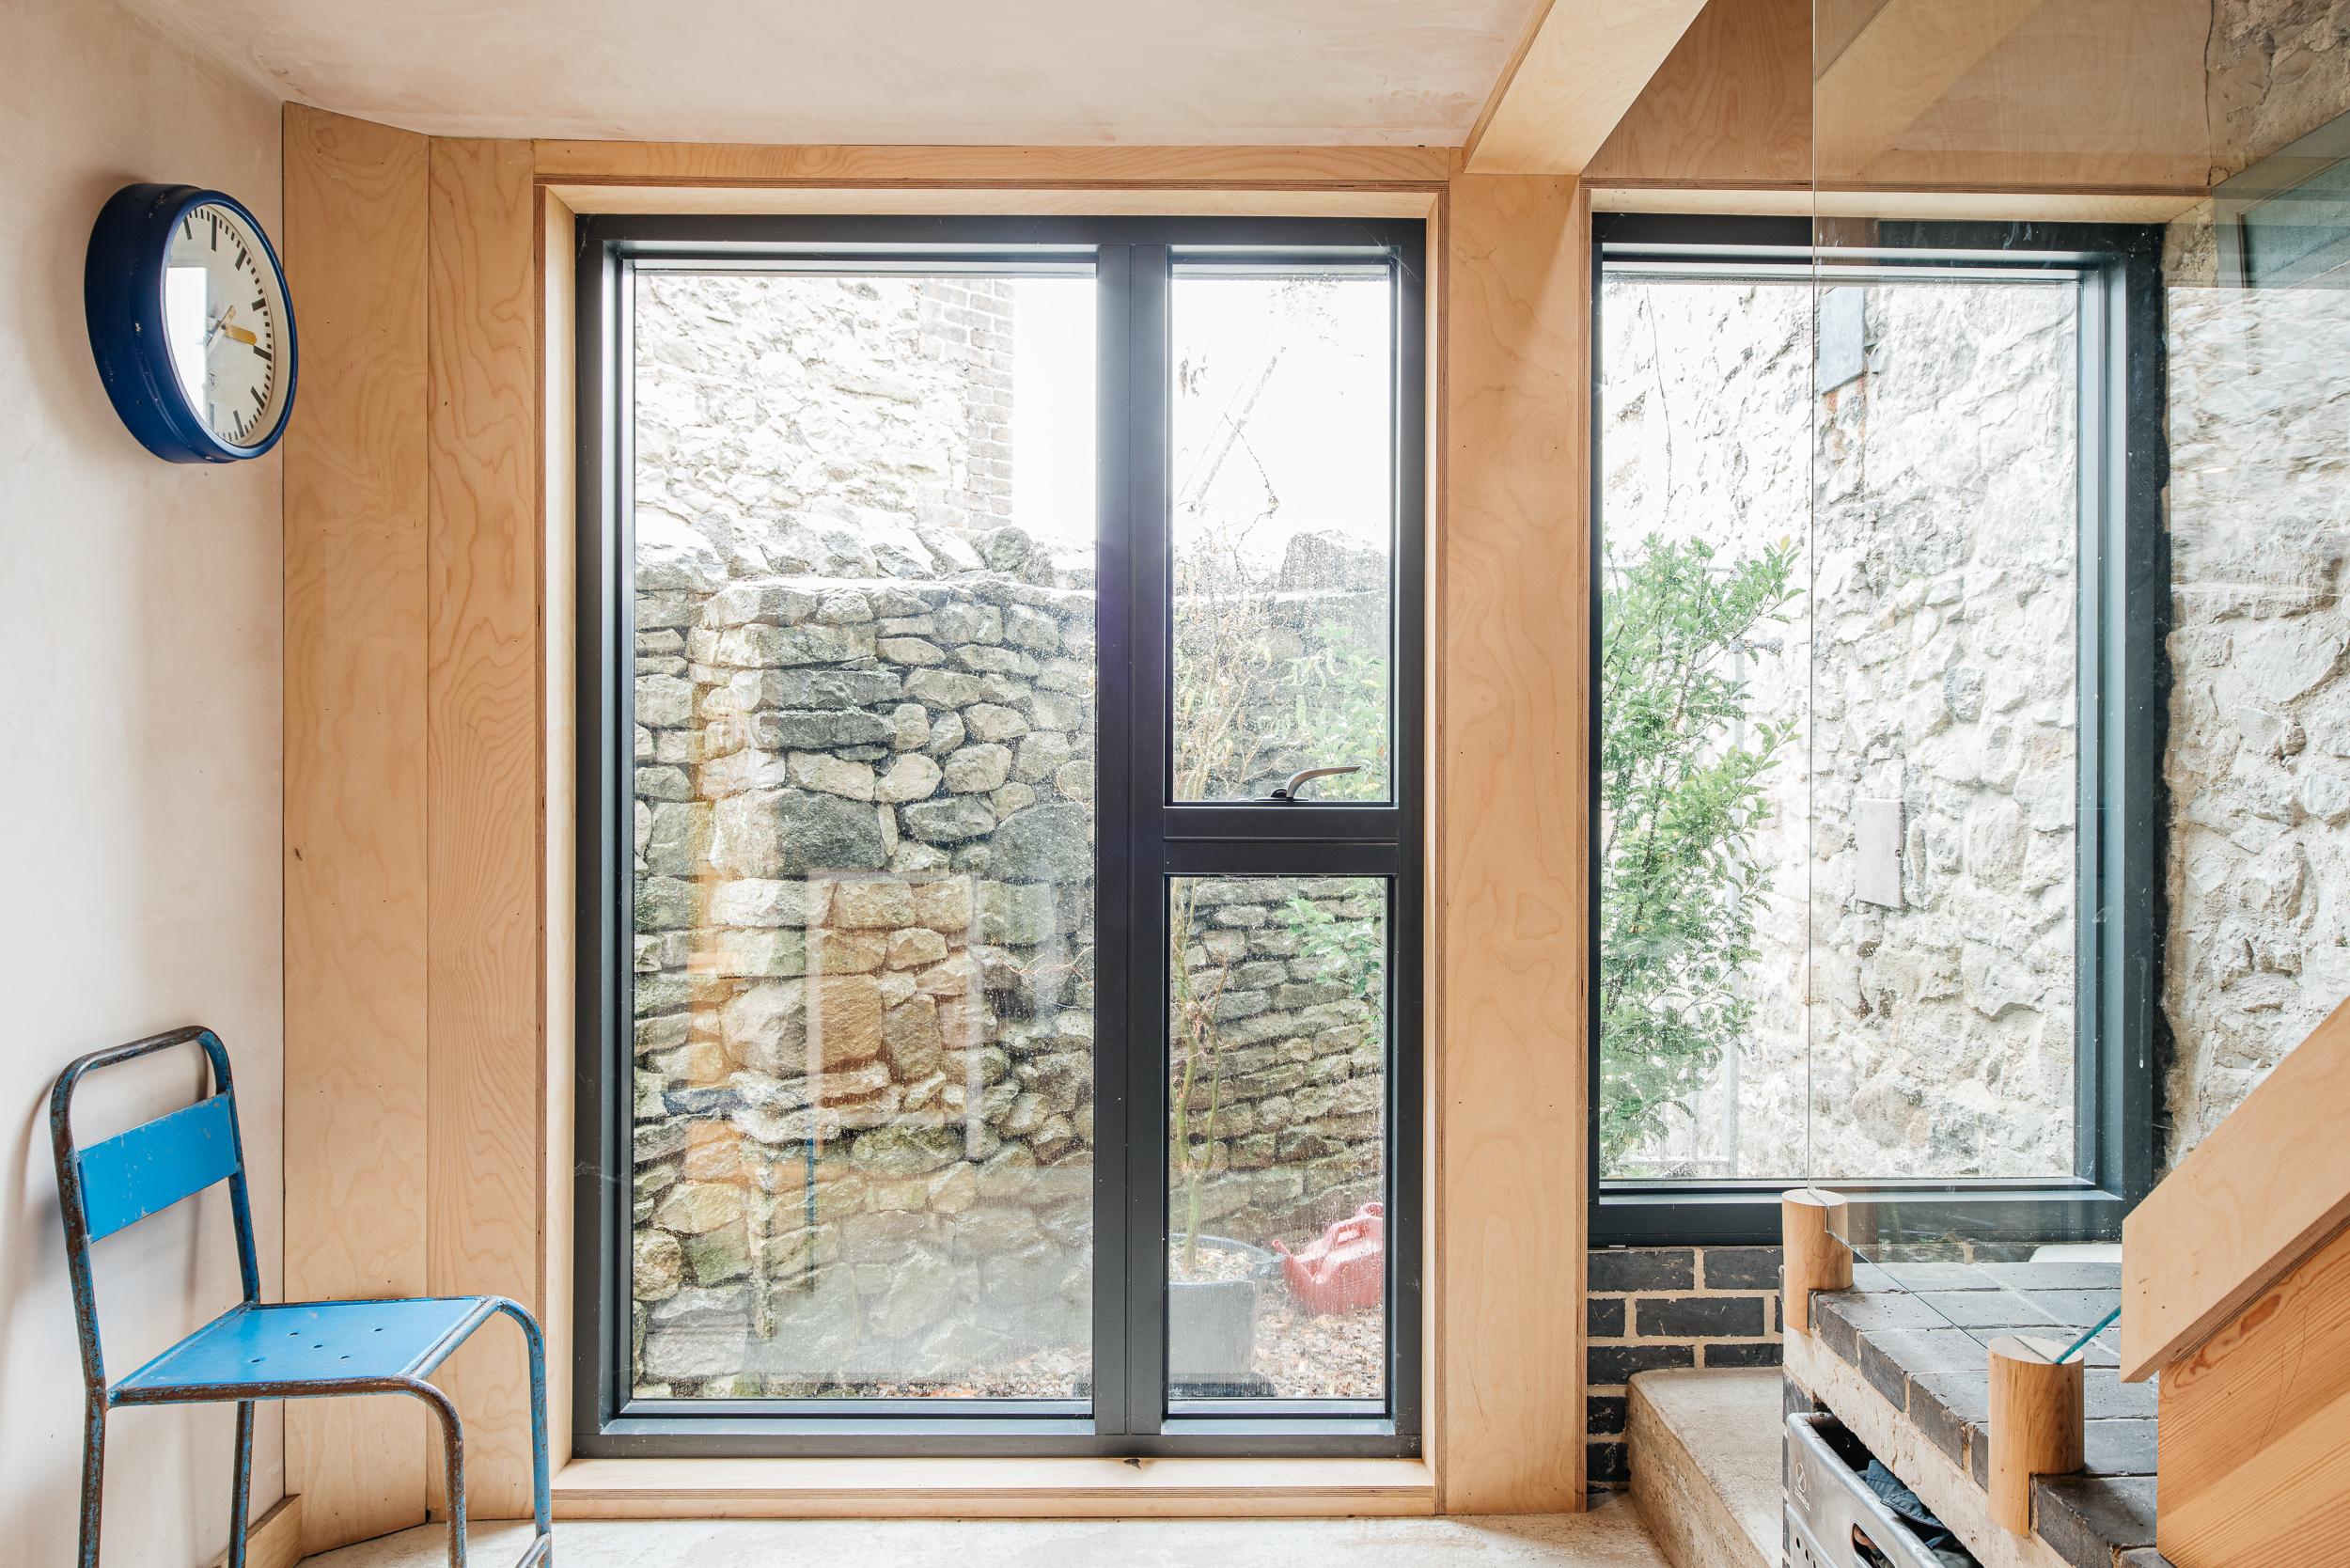 South facing glazing